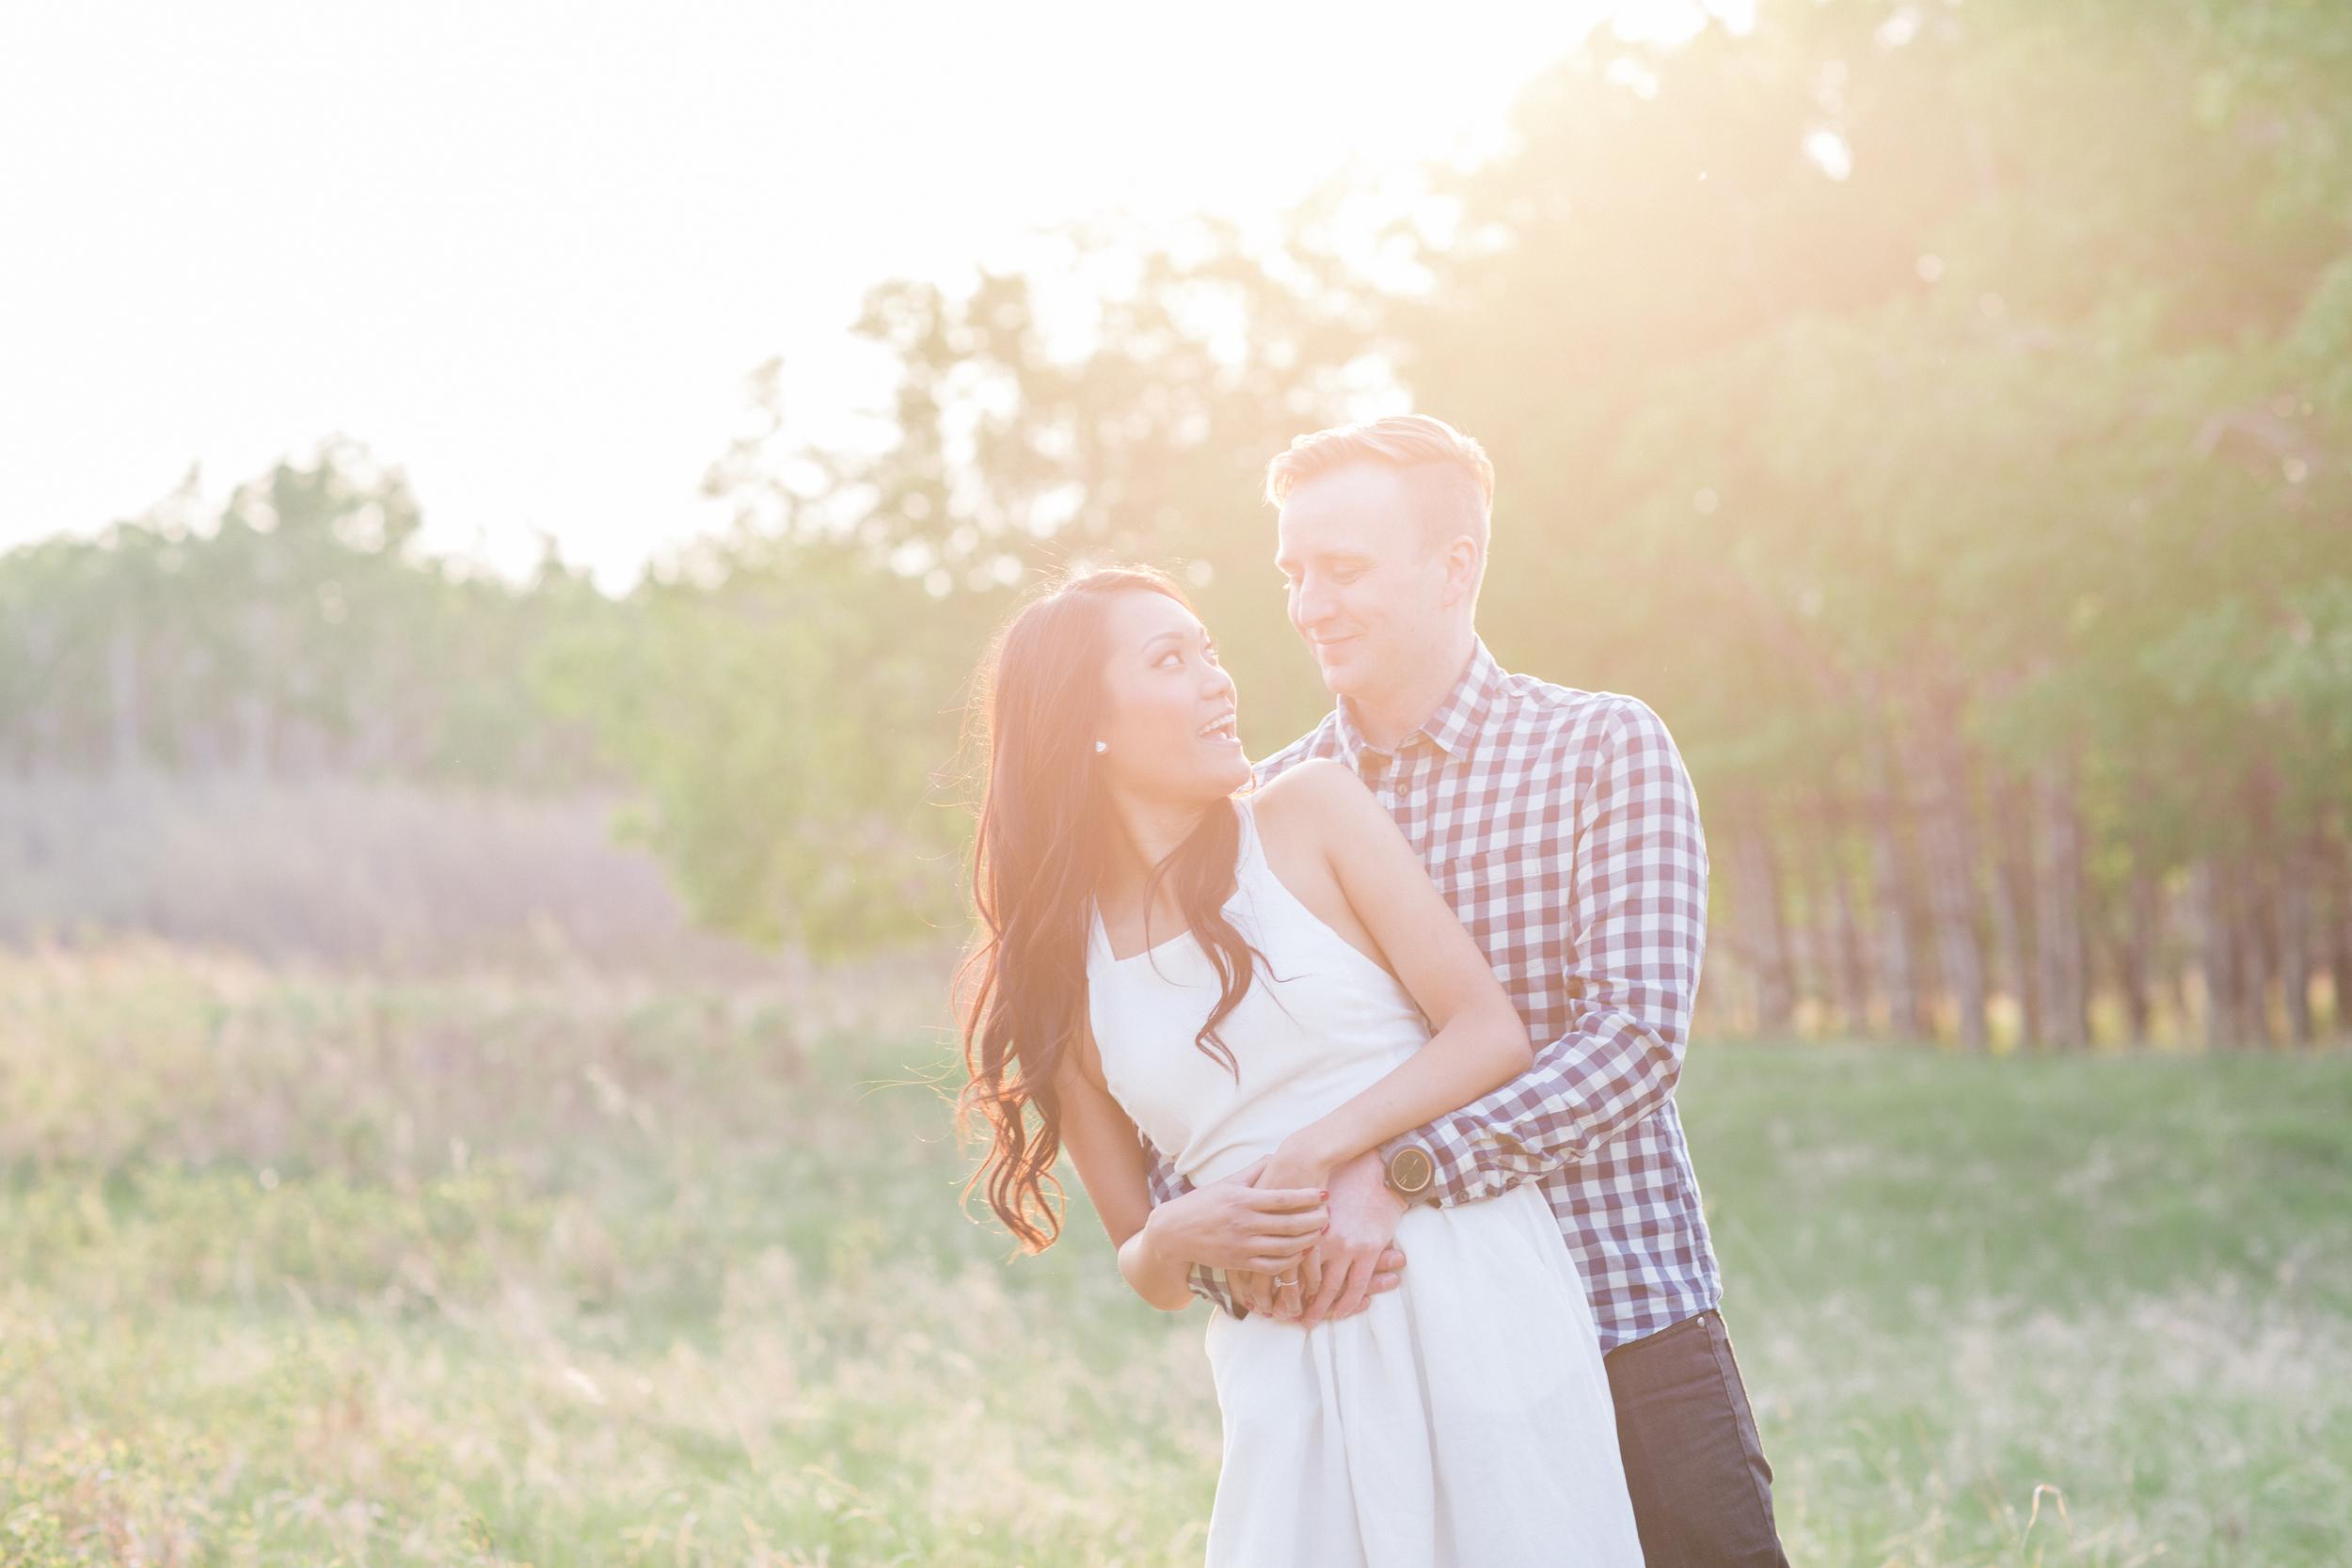 EngagementPhotography_ParrishHousePhotos_StefanieShawn_53.jpg